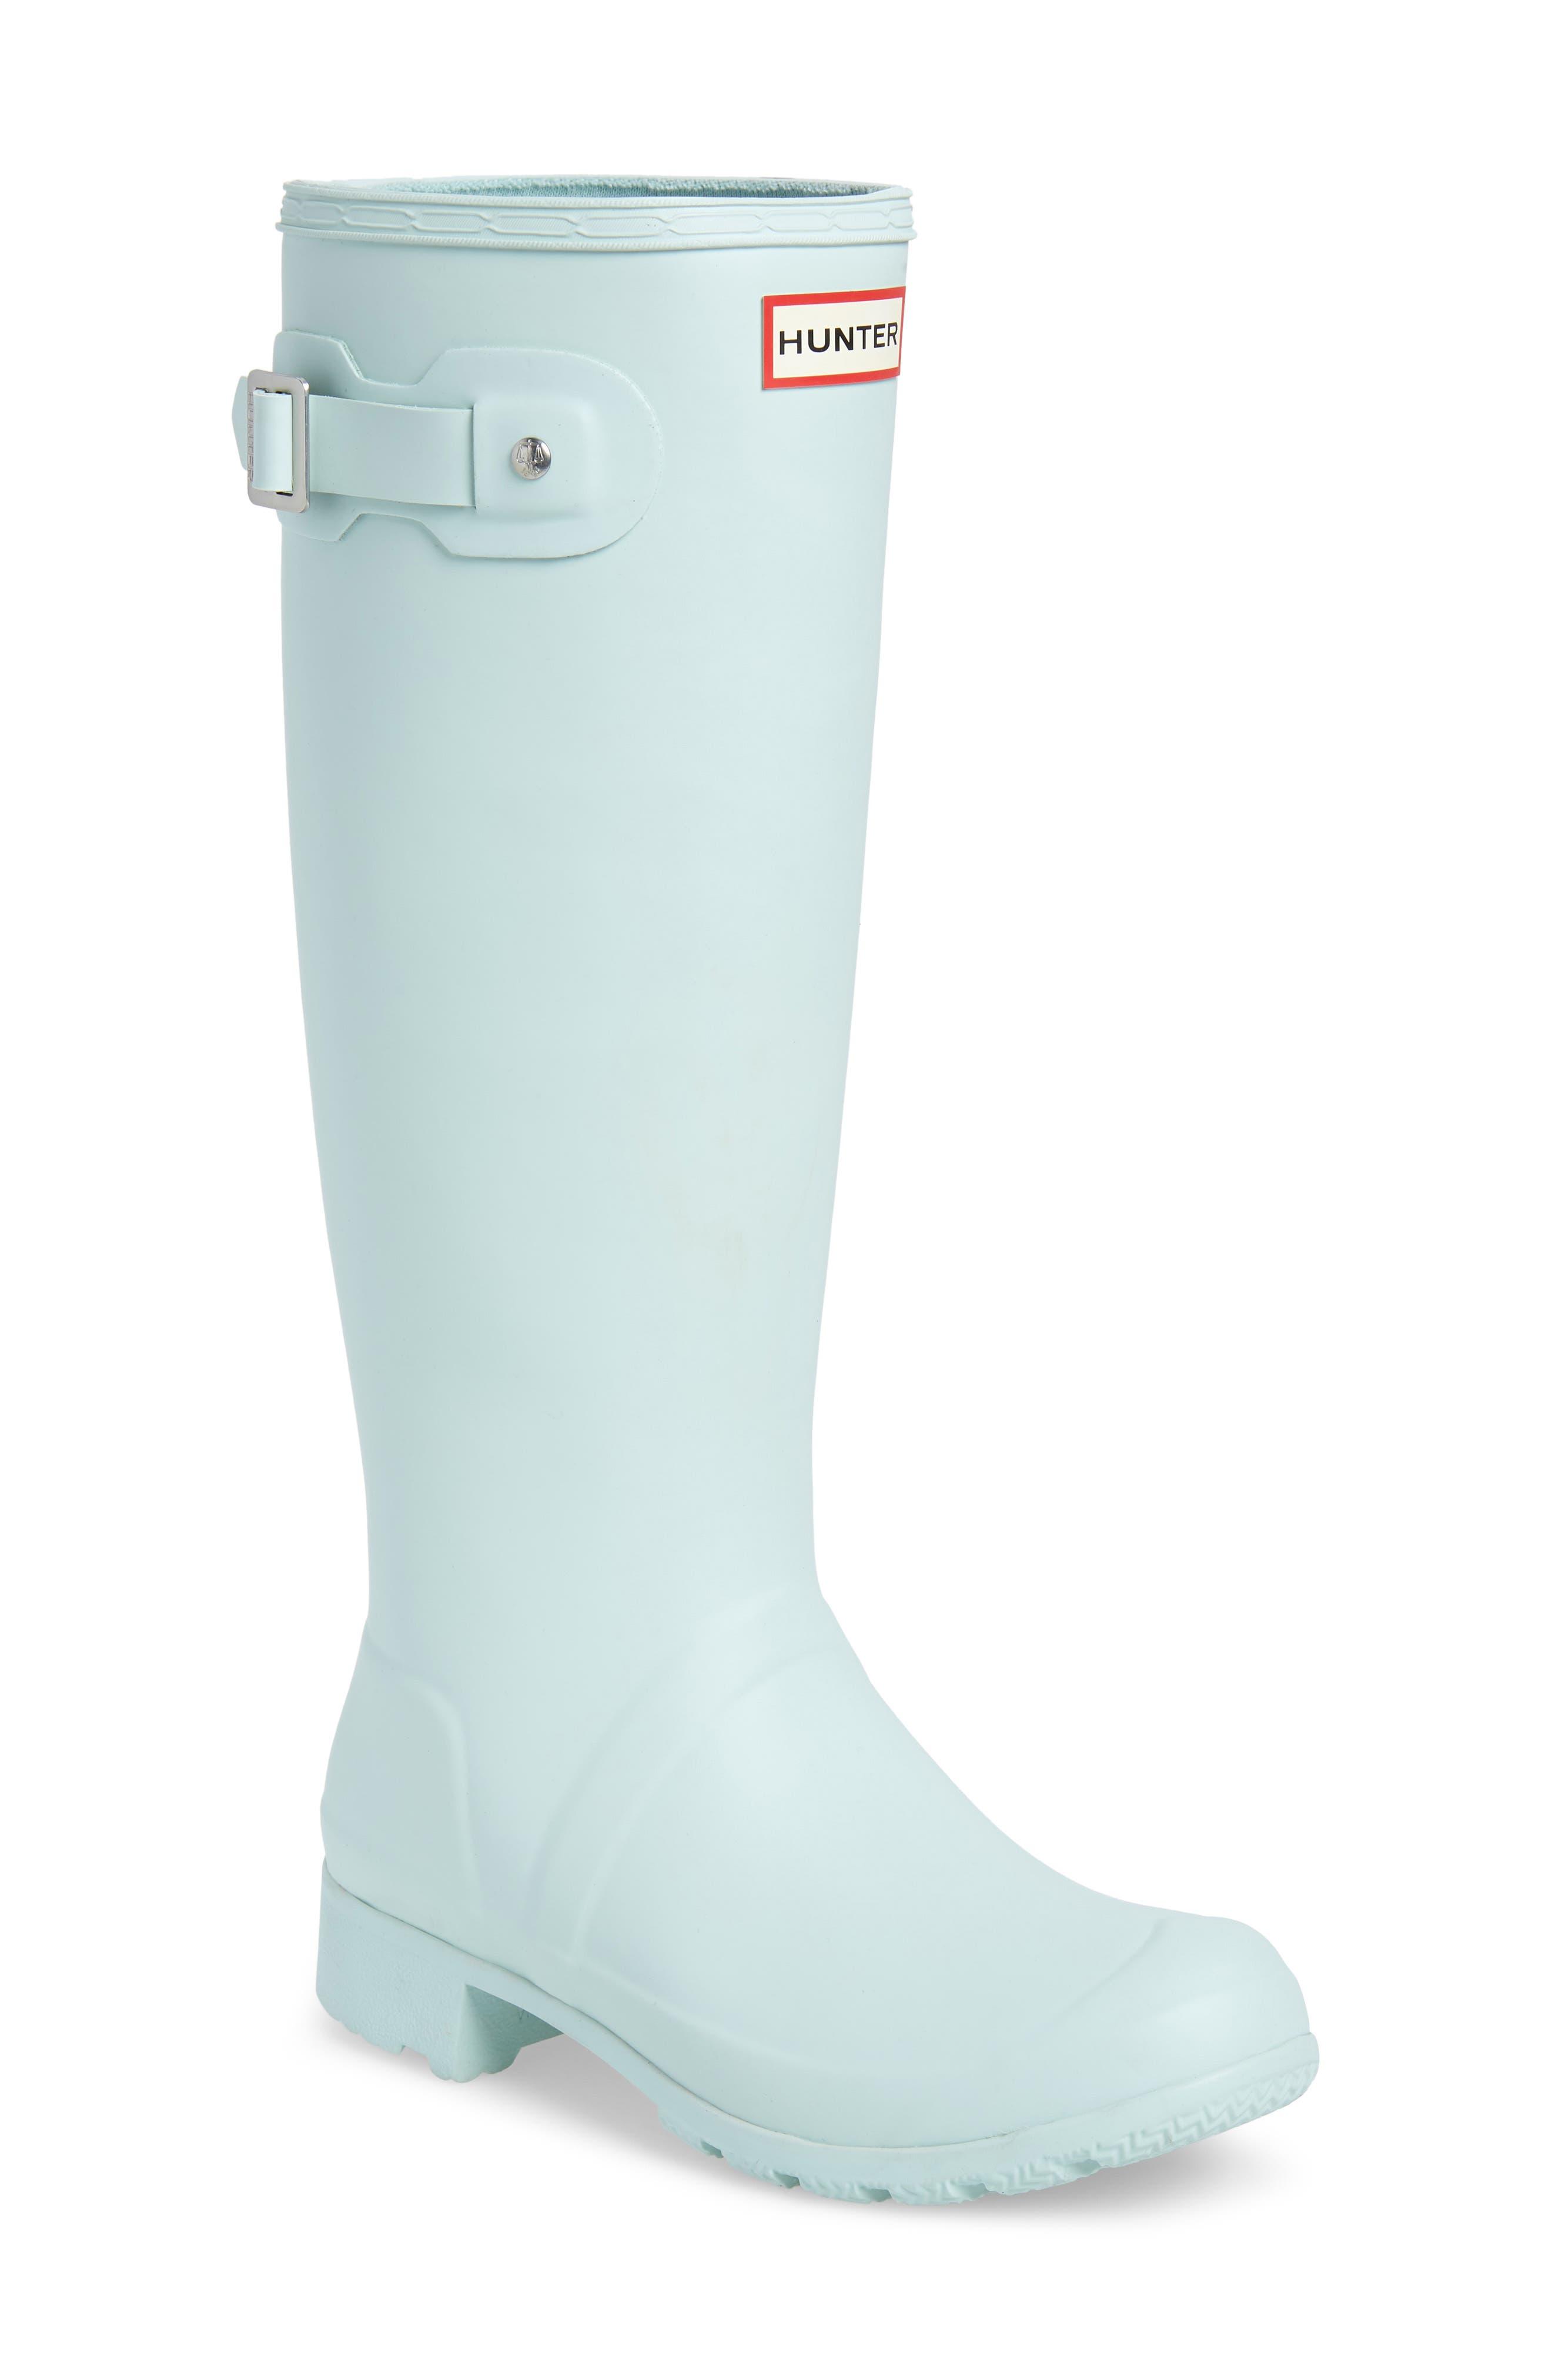 HUNTER Tour Packable Waterproof Rain Boot, Main, color, AQUA FOAM RUBBER